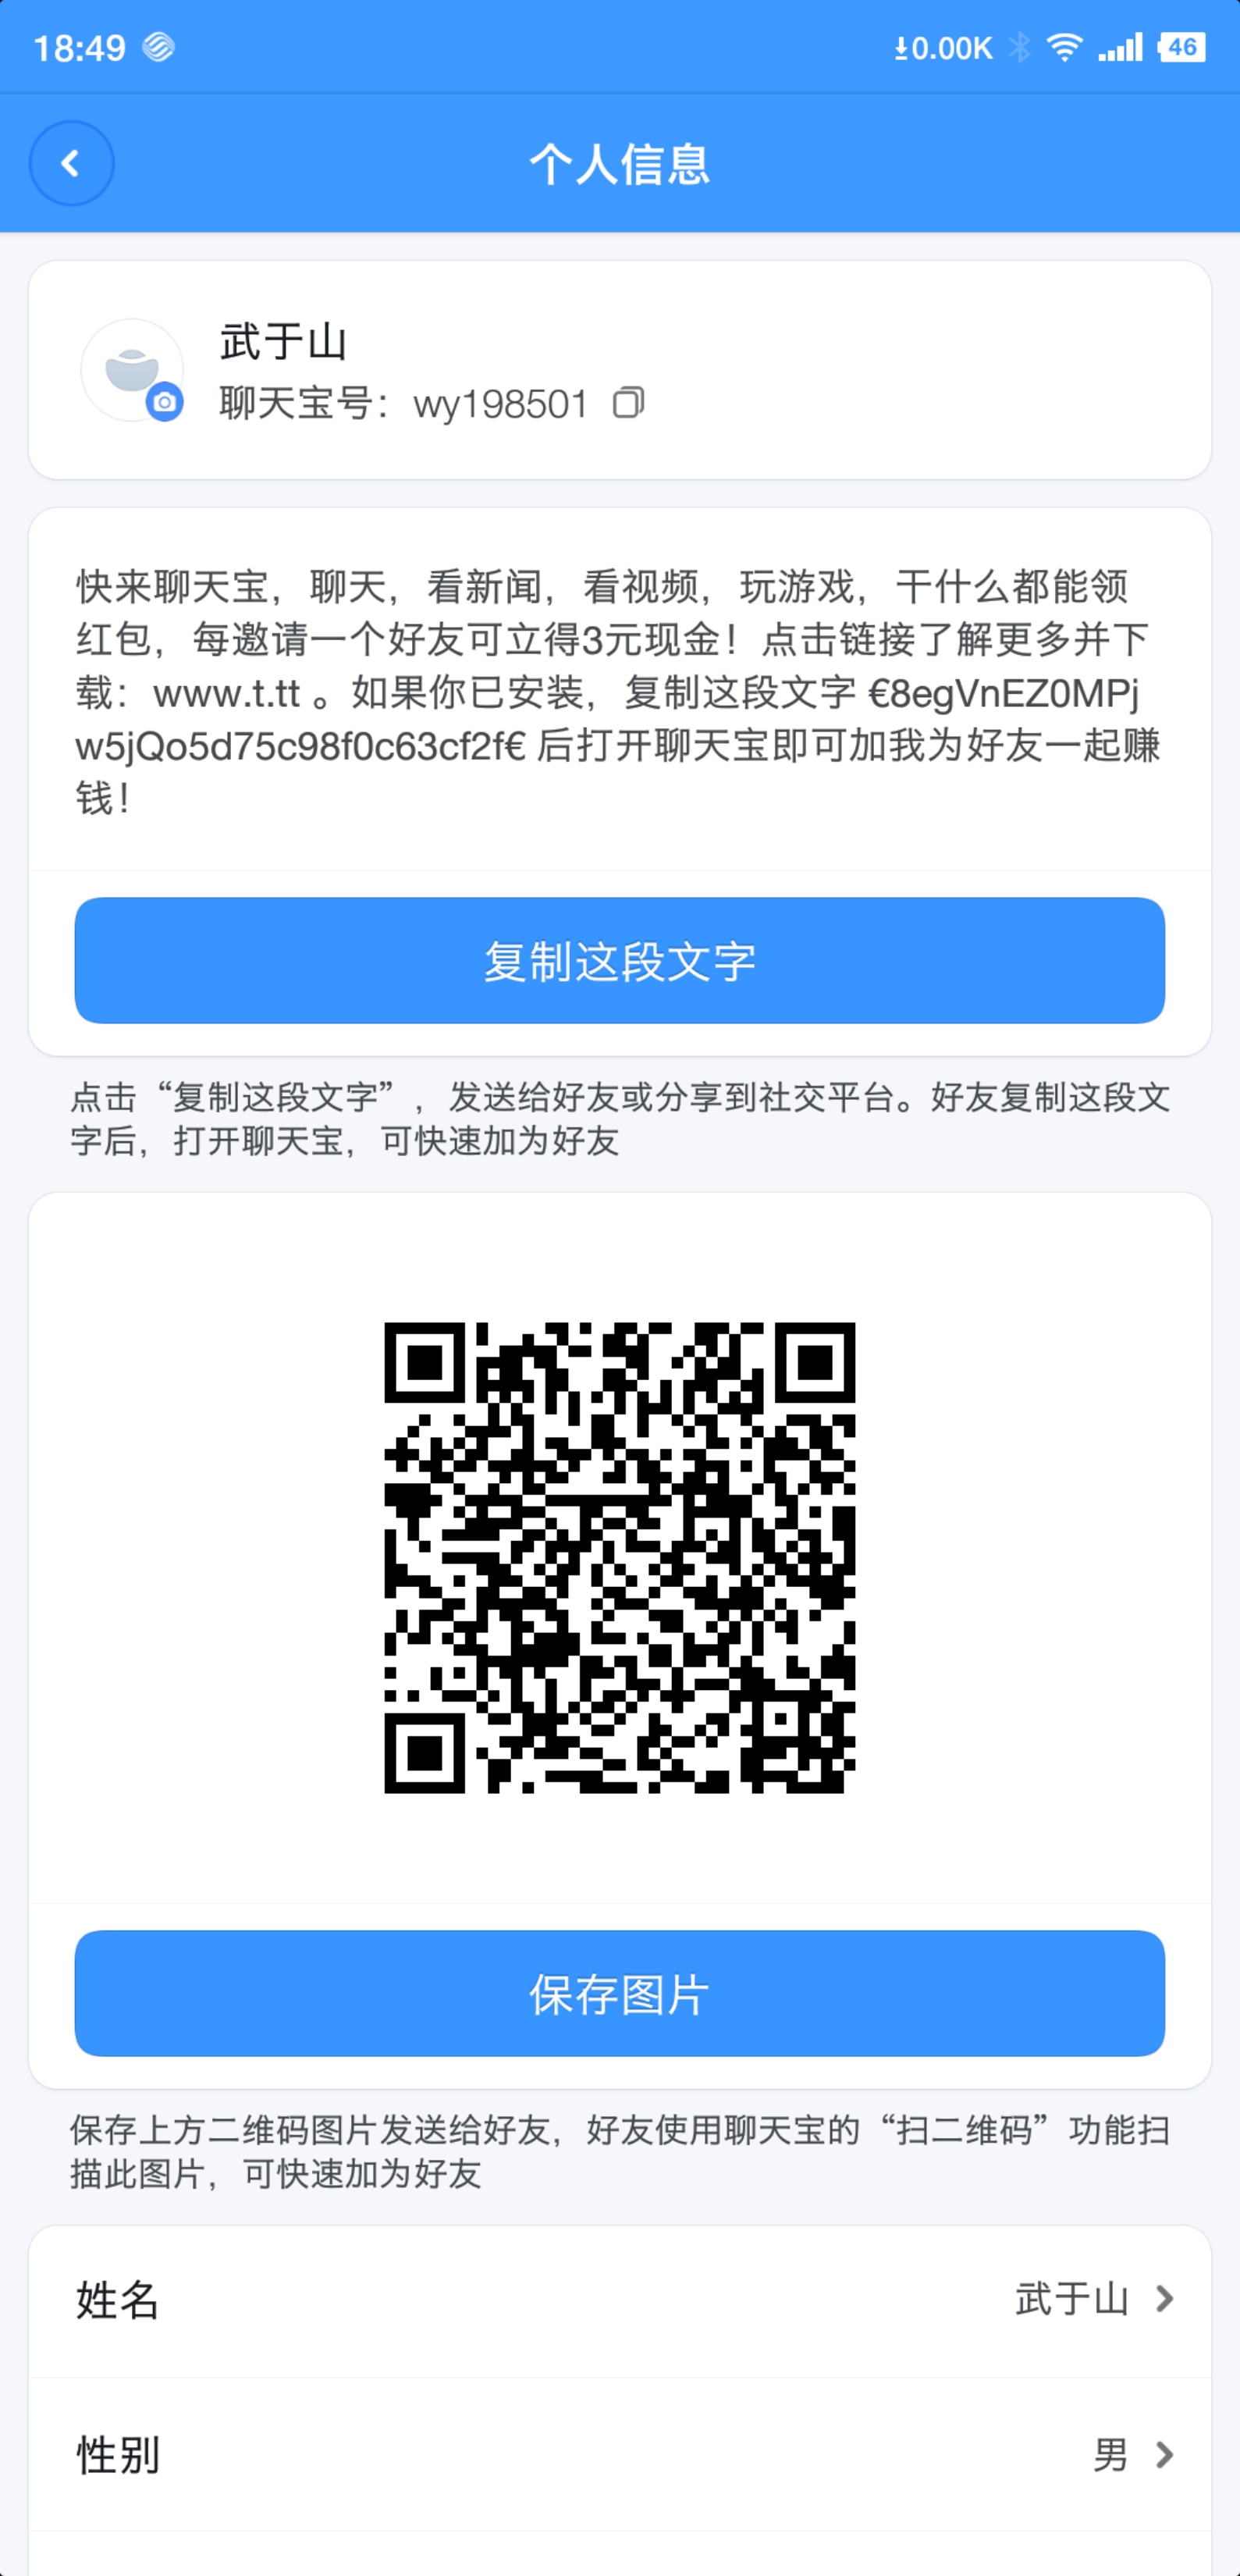 Screenshot_2019-01-27-18-49-38-368_???.png